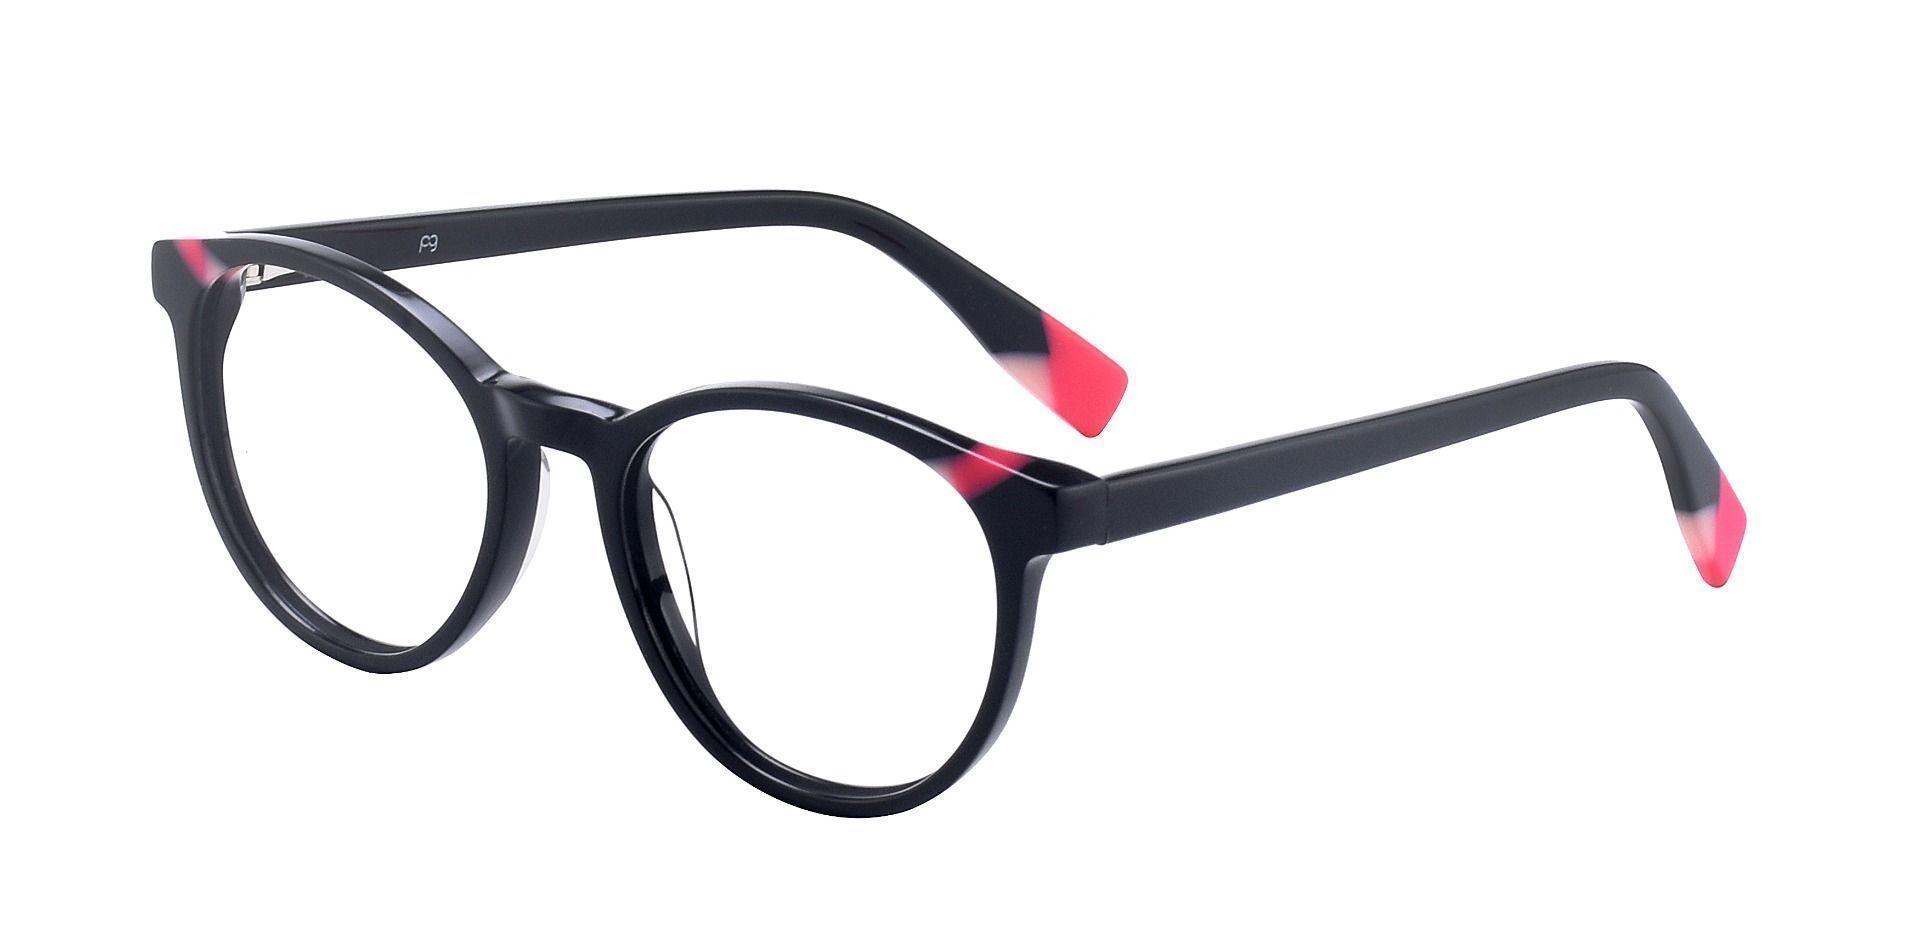 Odette Oval Prescription Glasses - The Frame Is Black And Red